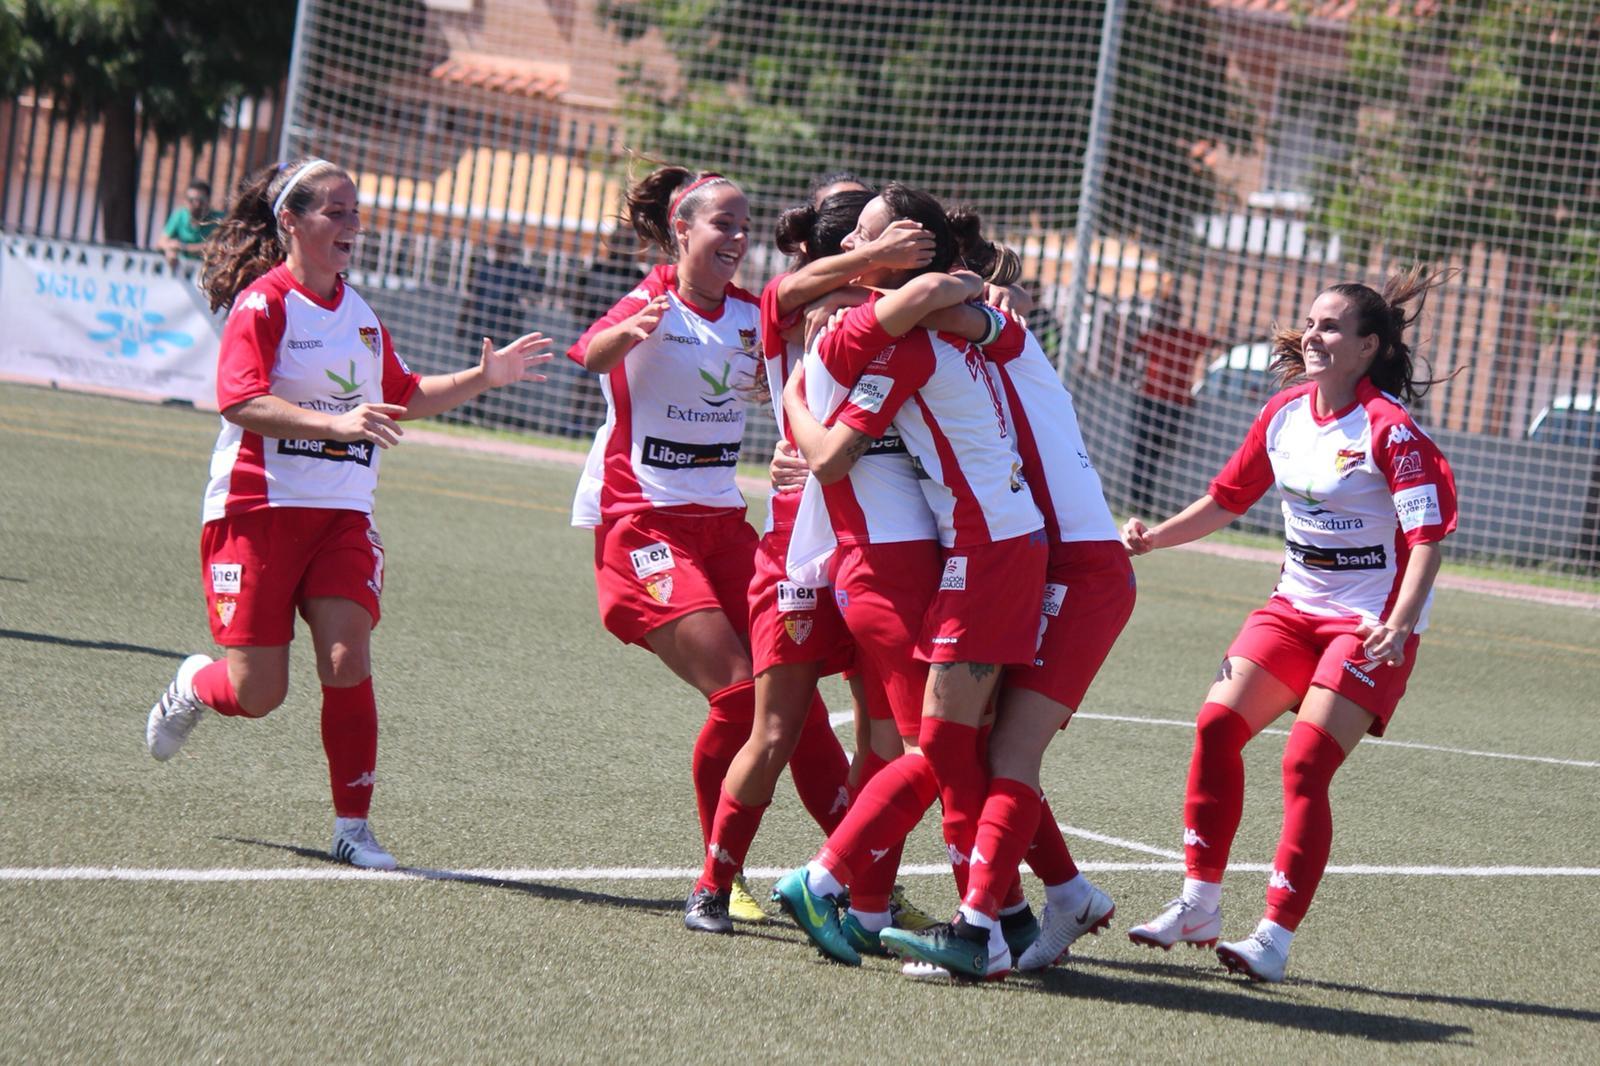 El Liberbank Santa Teresa Badajoz se impone con fuerza a Sporting Huelva B